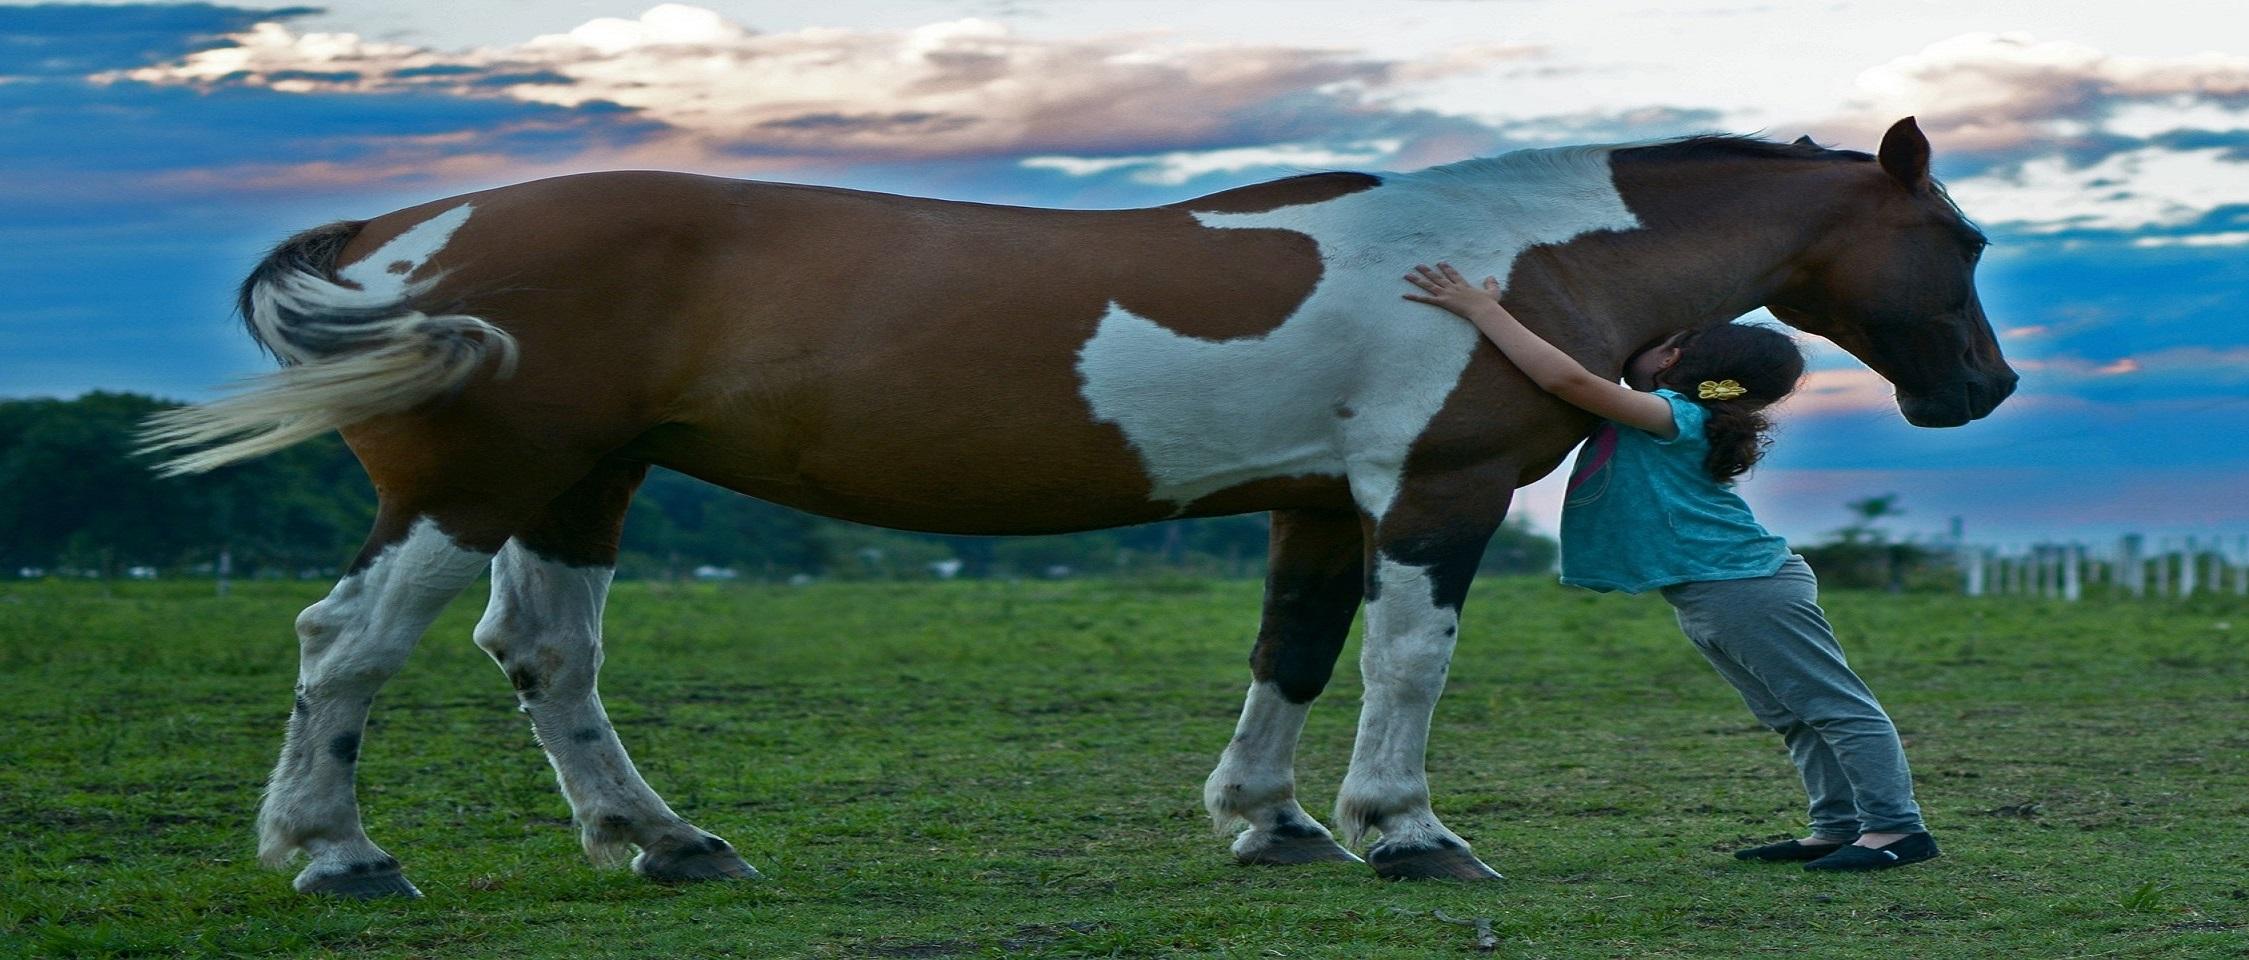 horse-2536537_1920